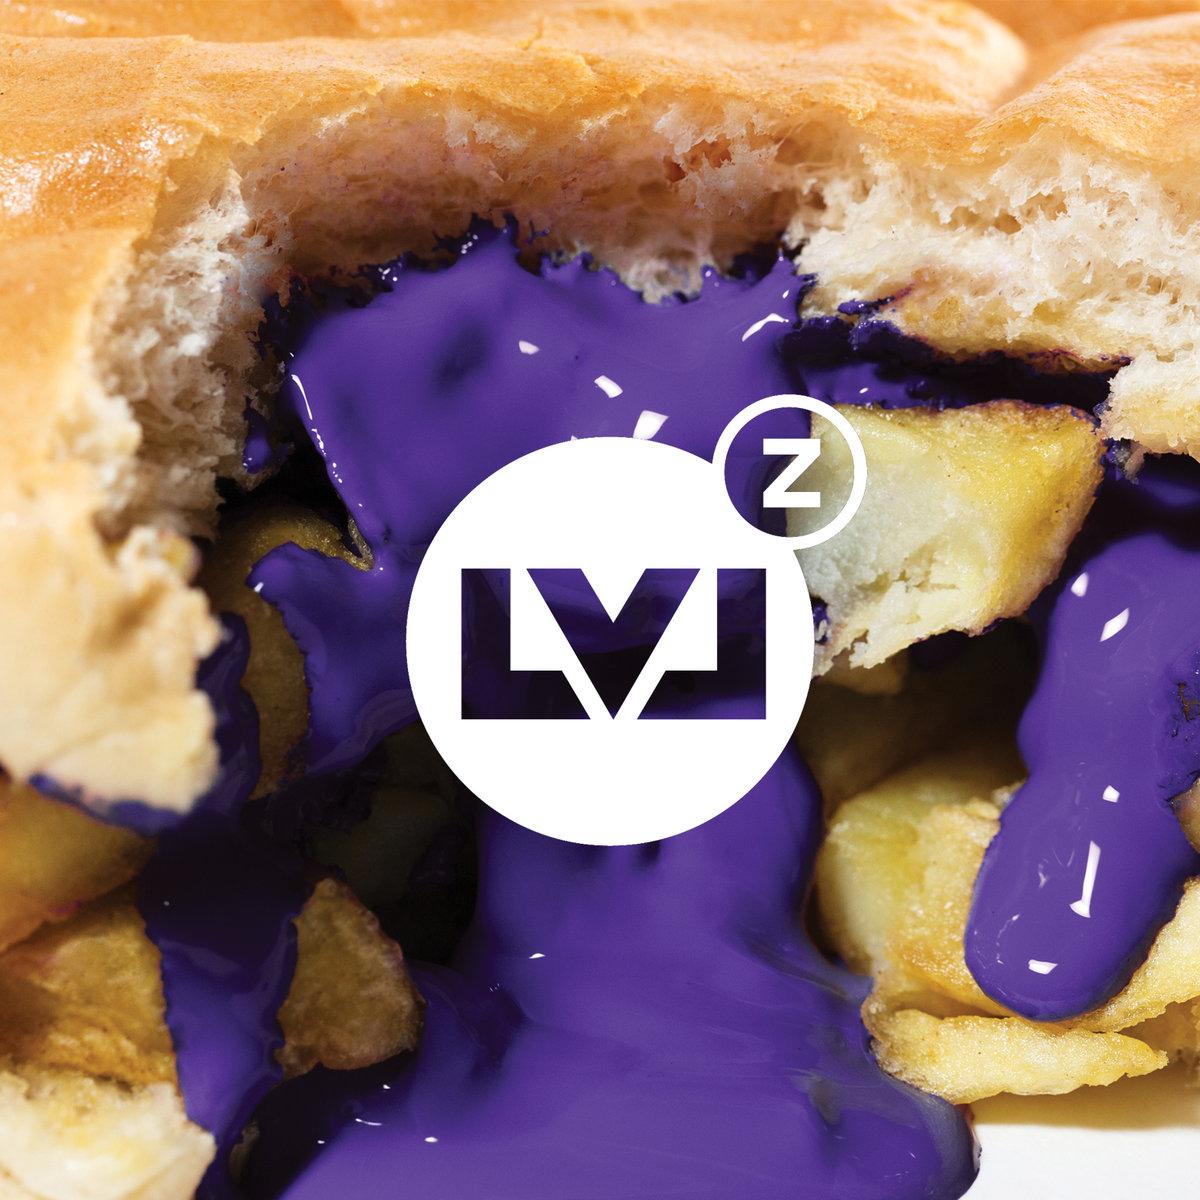 LEVELZ LVL 11 (SELF-RELEASED, 2016)